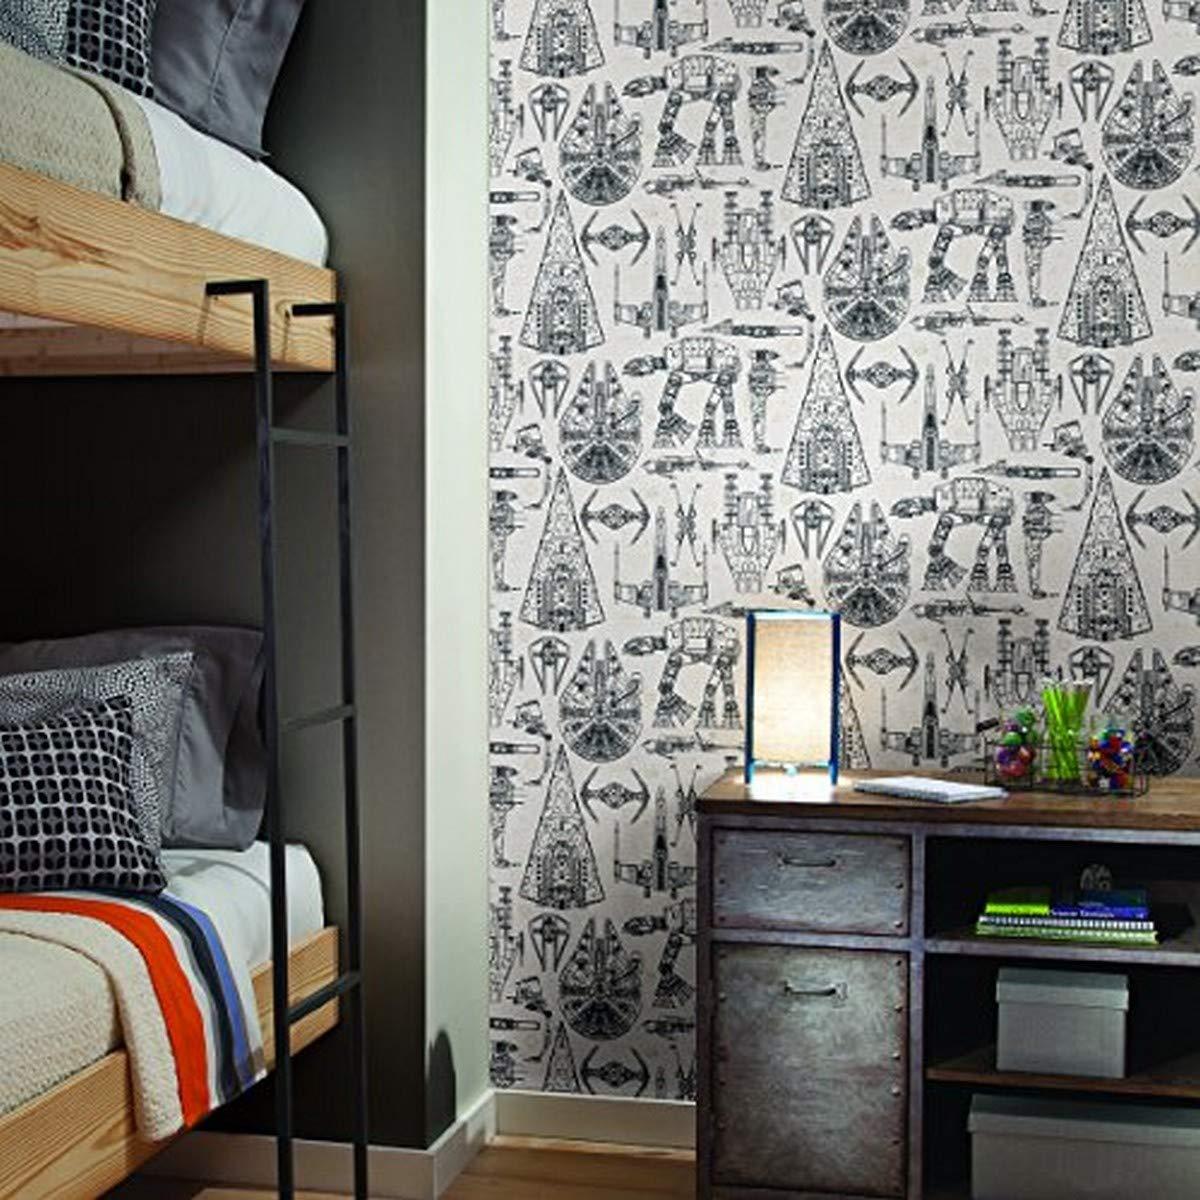 Roommates Rmk11036wp Star Wars Blueprint Peel And Stick Wallpaper Blue 20 5 X 16 5 Amazon Ca Tools Home Improvement